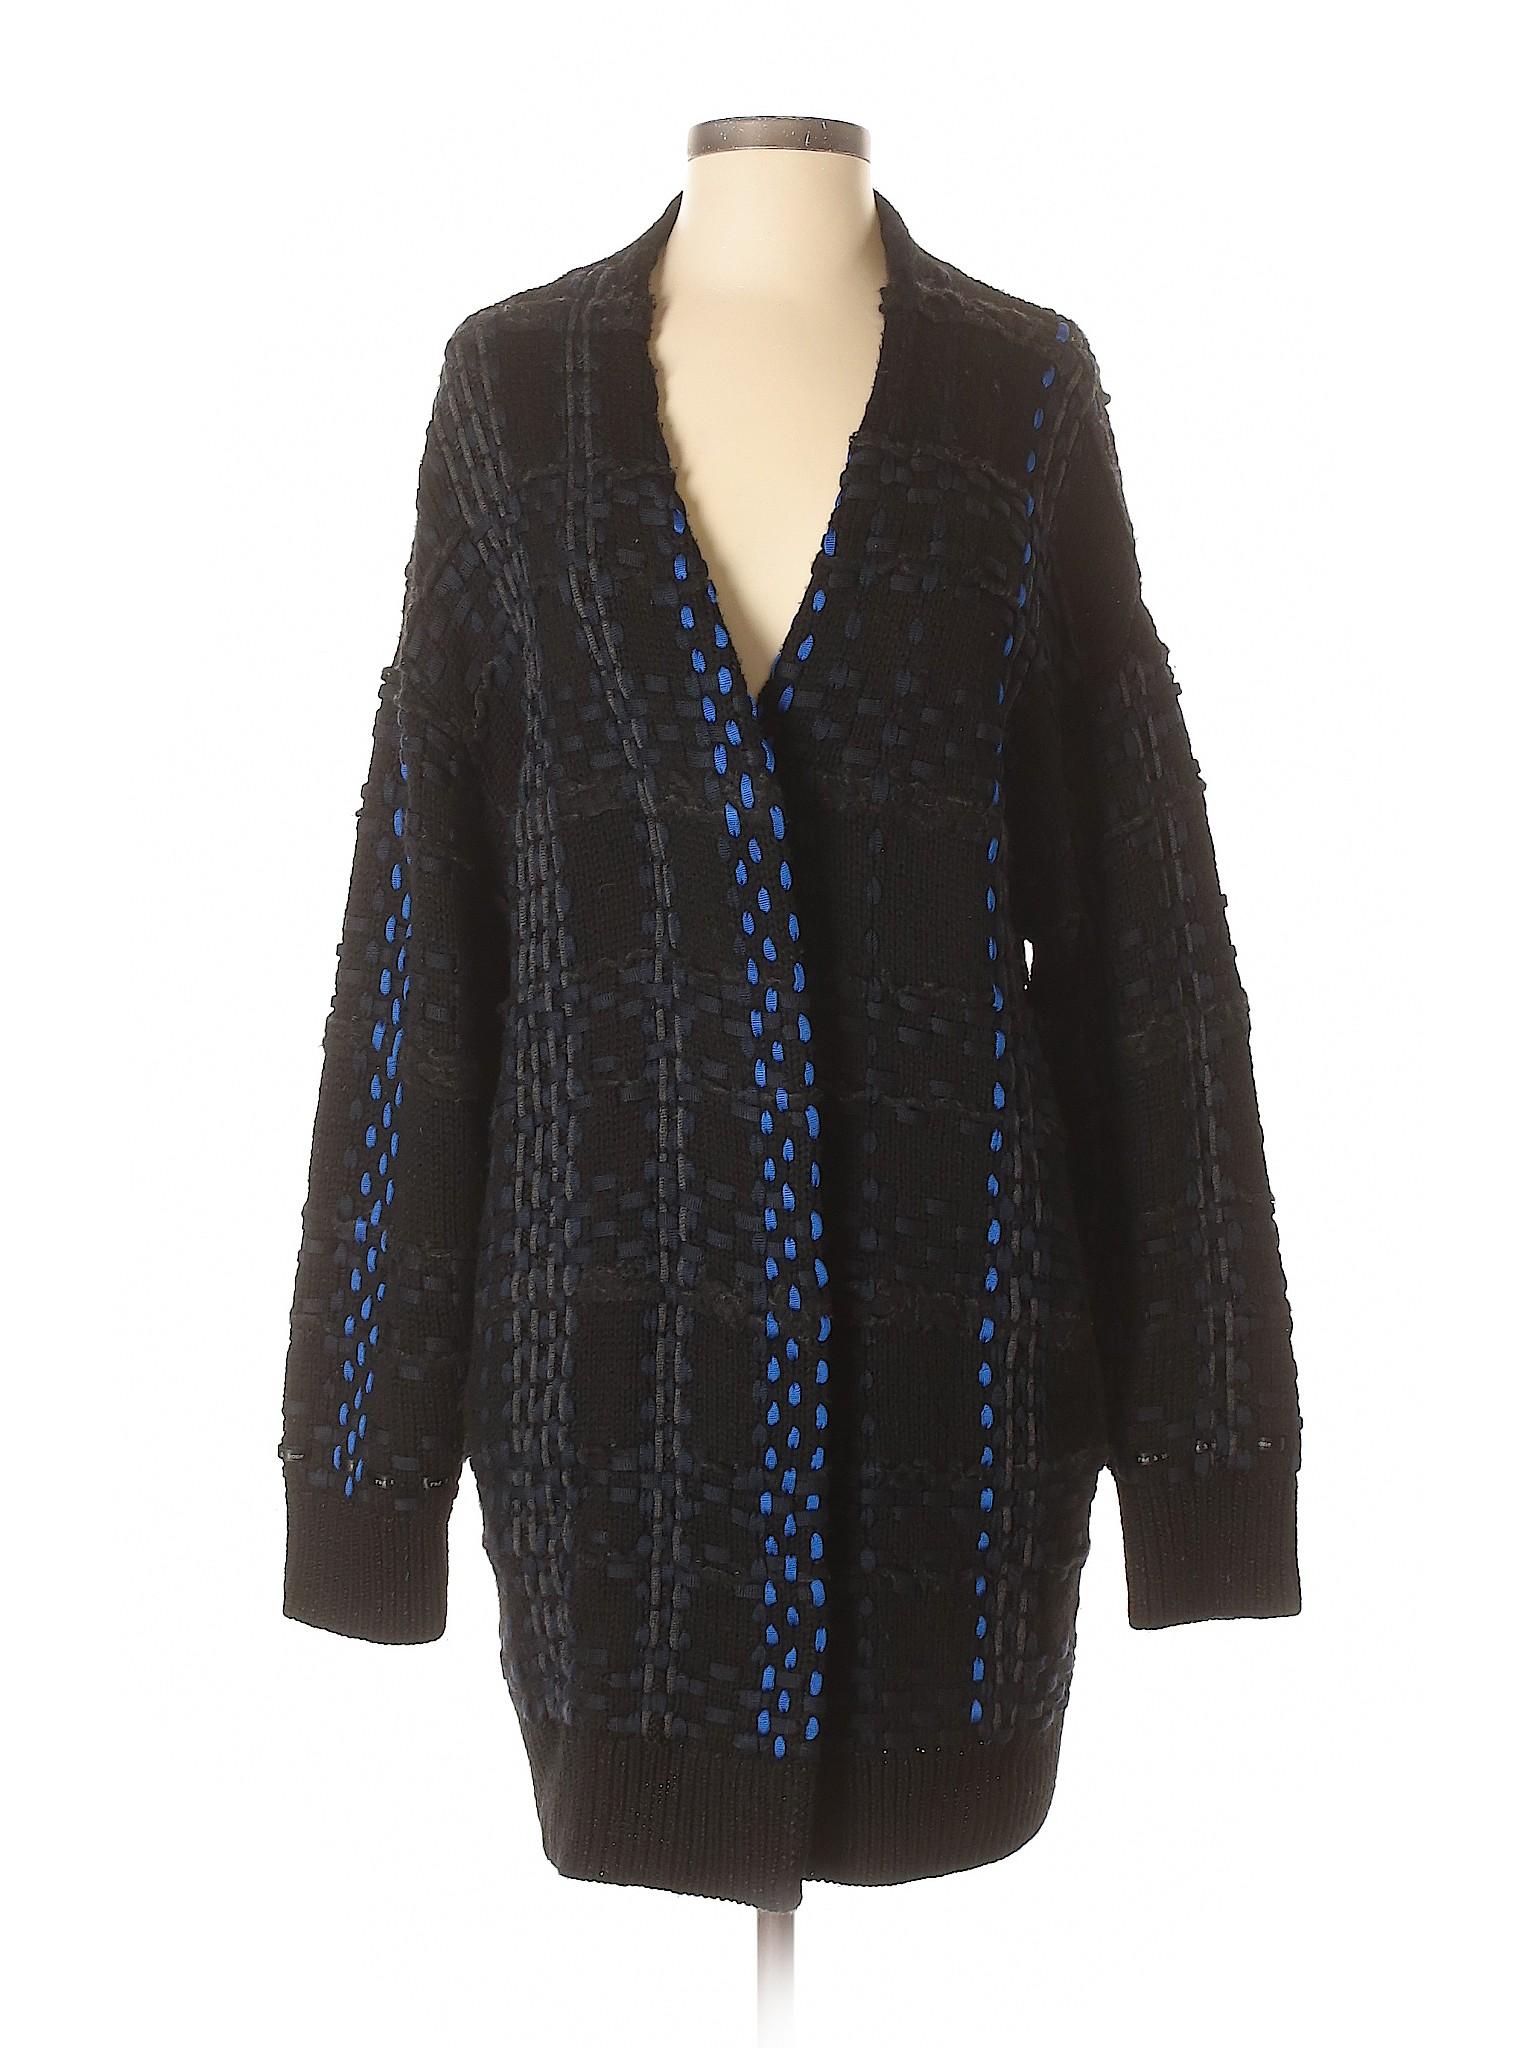 winter Wool amp; Rag Bone Cardigan Boutique xPgUqa